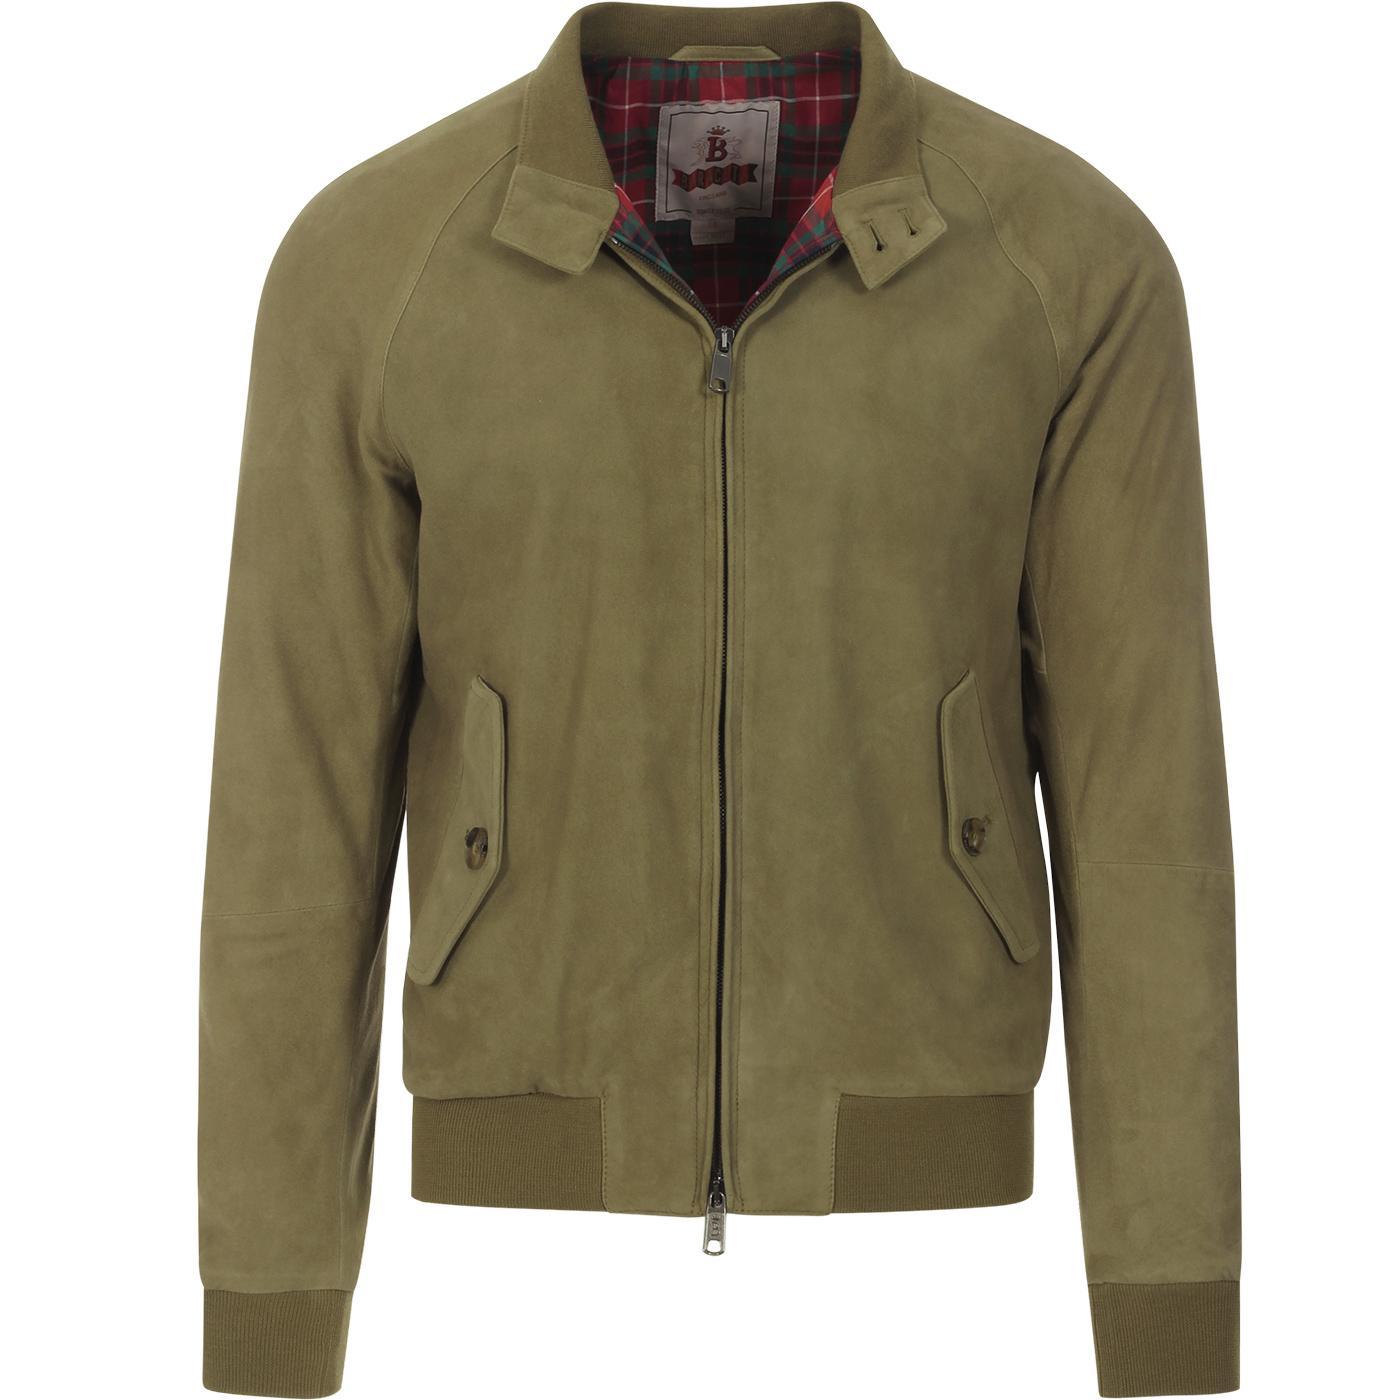 BARACUTA G9 Suede Mod Harrington Jacket Army Green